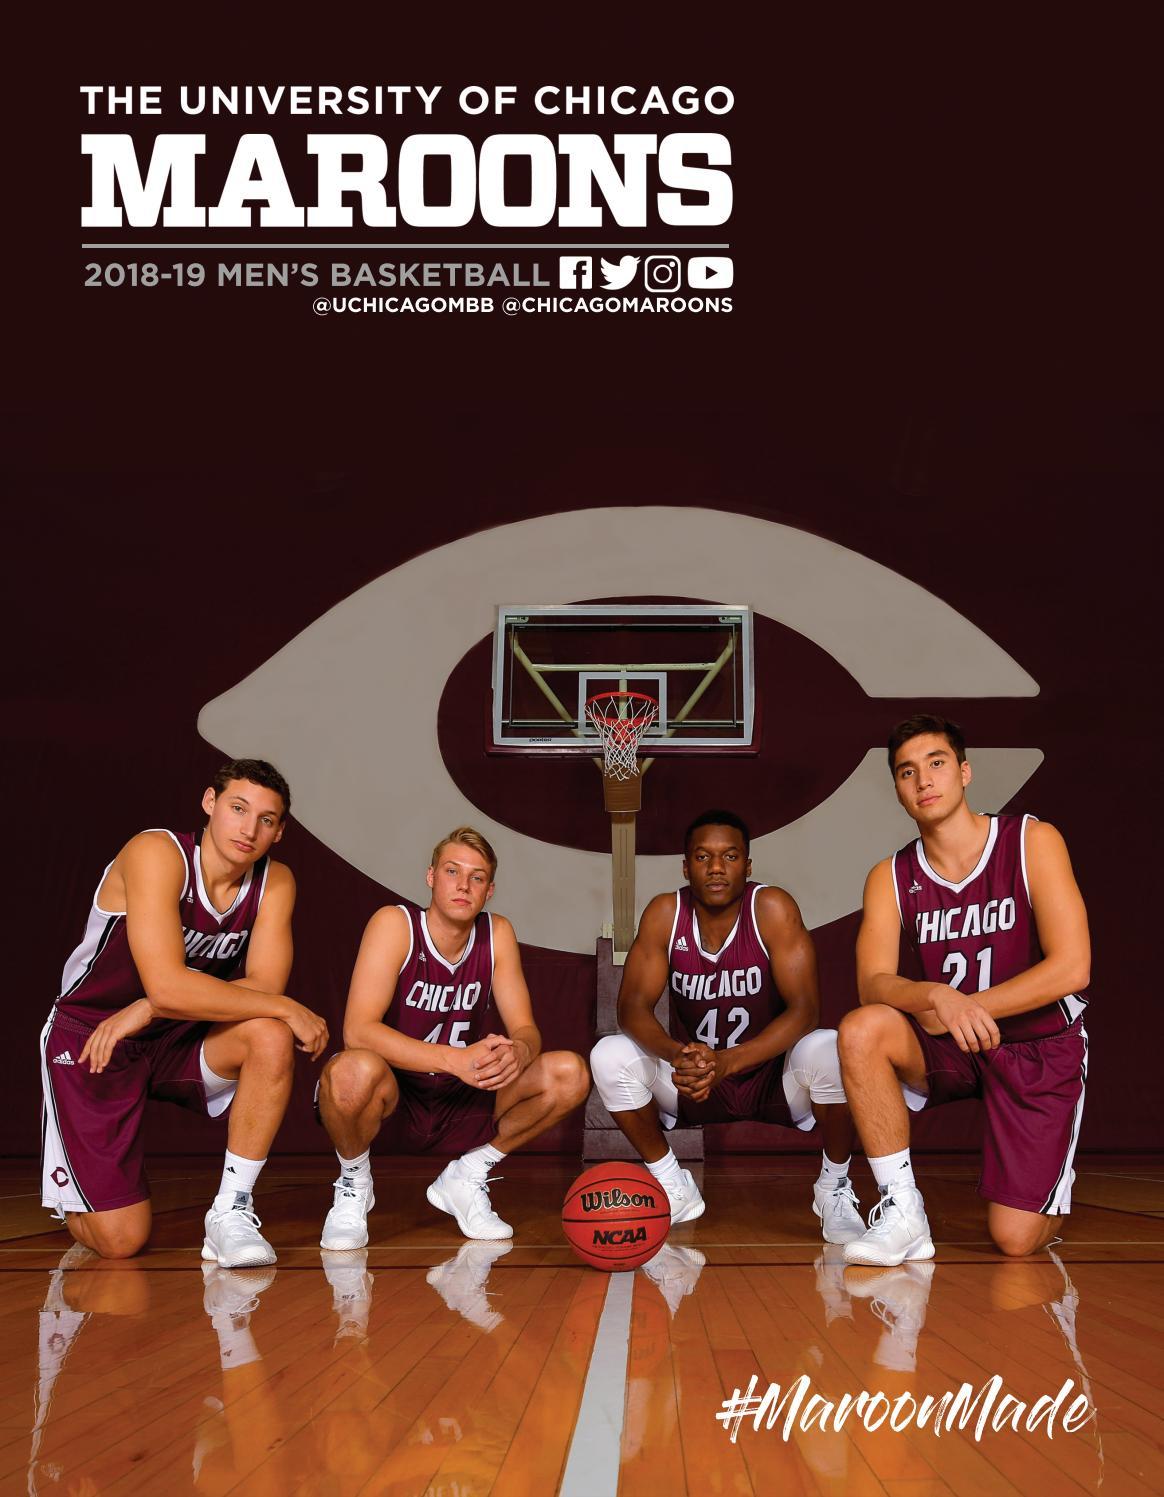 745aff6b6eb8a7 UChicago Men s Basketball Yearbook 2018-19 by University of Chicago  Athletics - issuu